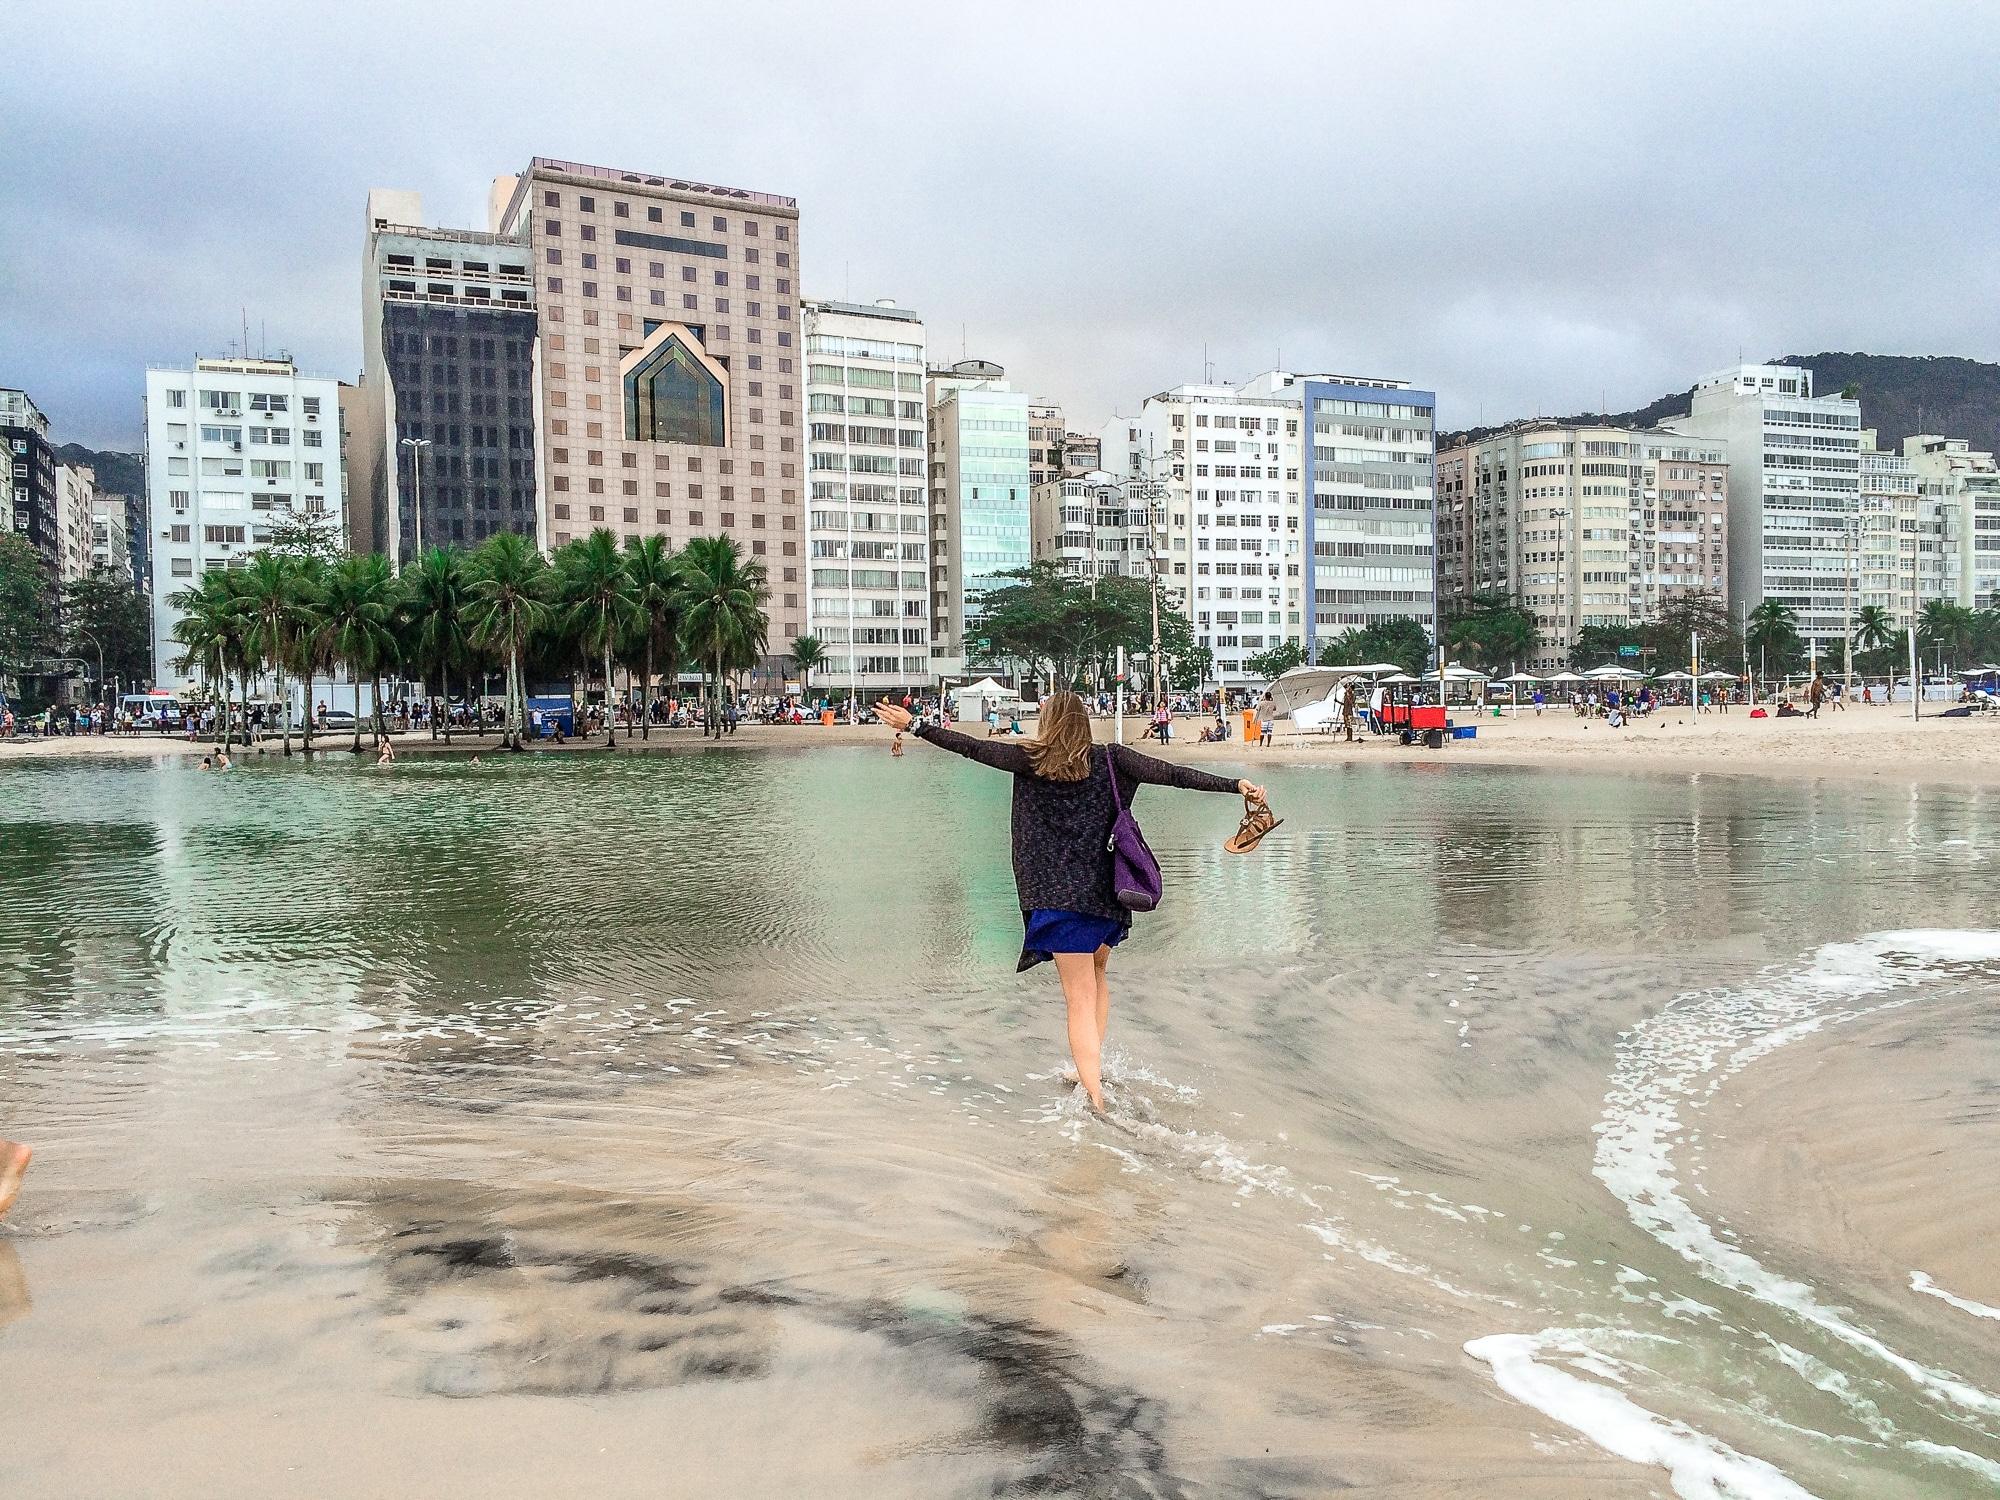 Rückblick: Mein Reisemonat Mai in Bildern